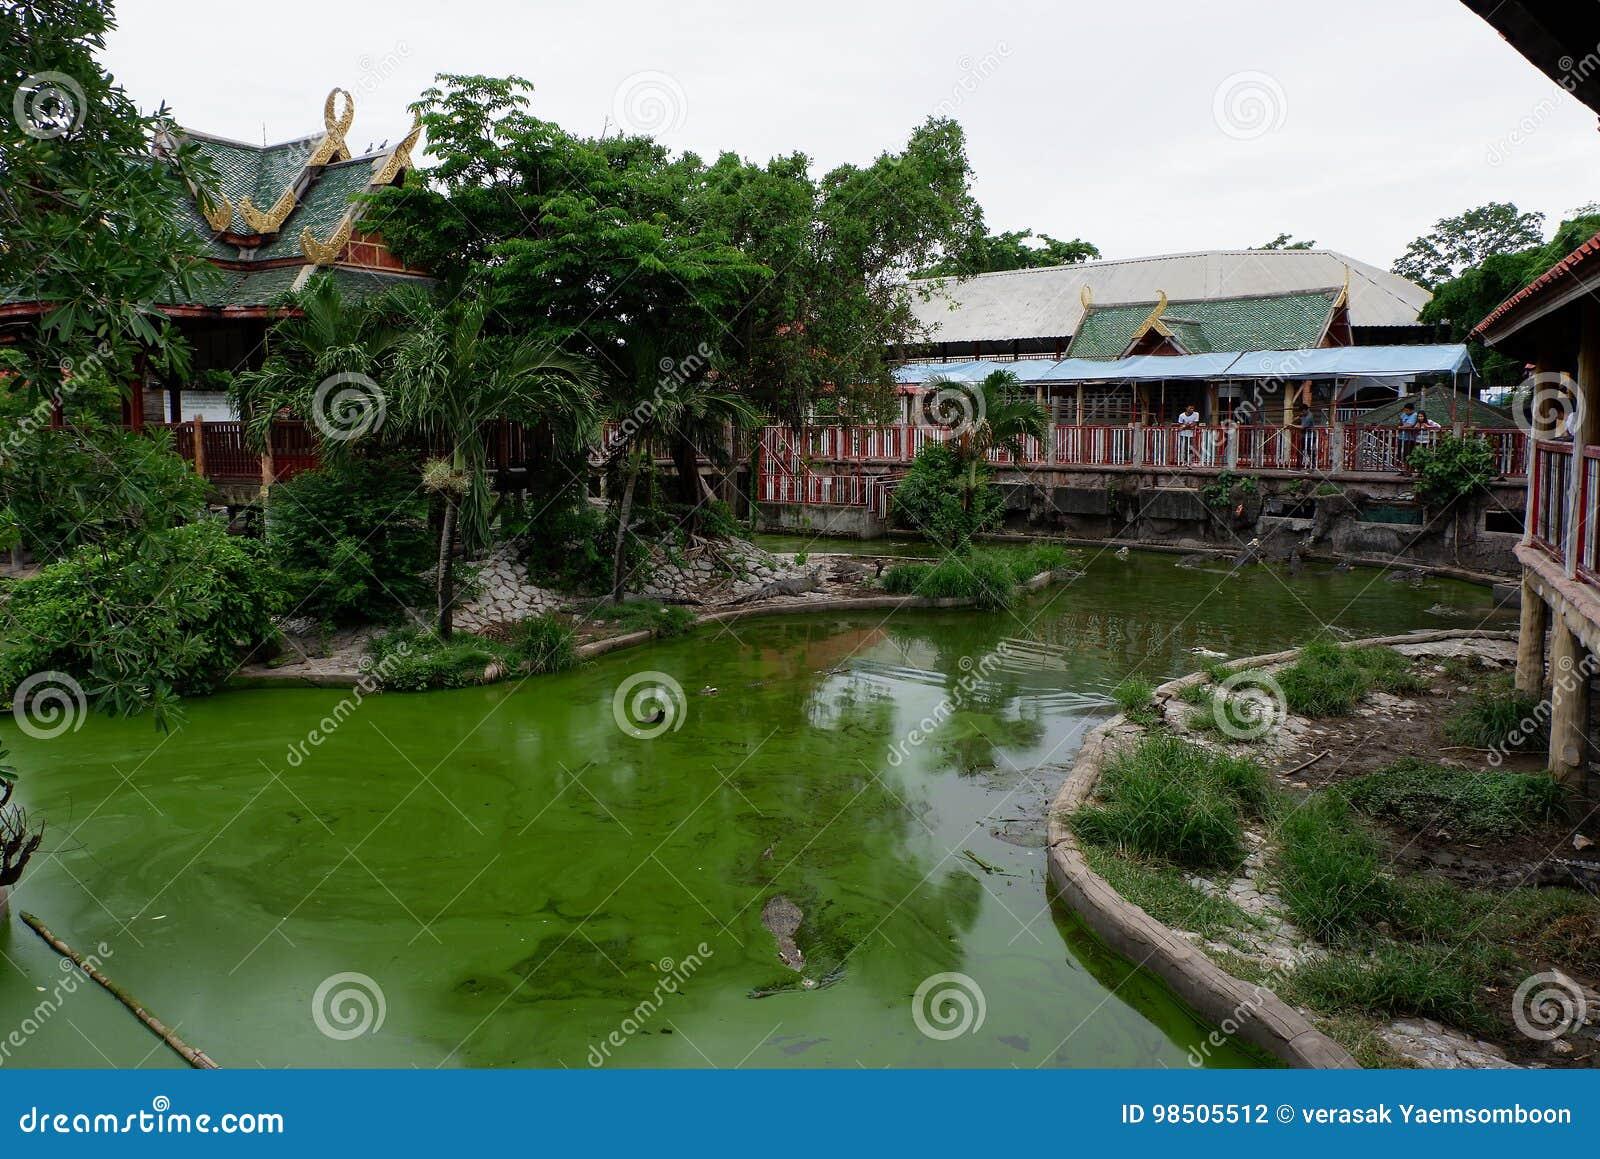 Krokodillandbouwbedrijf, Thailand